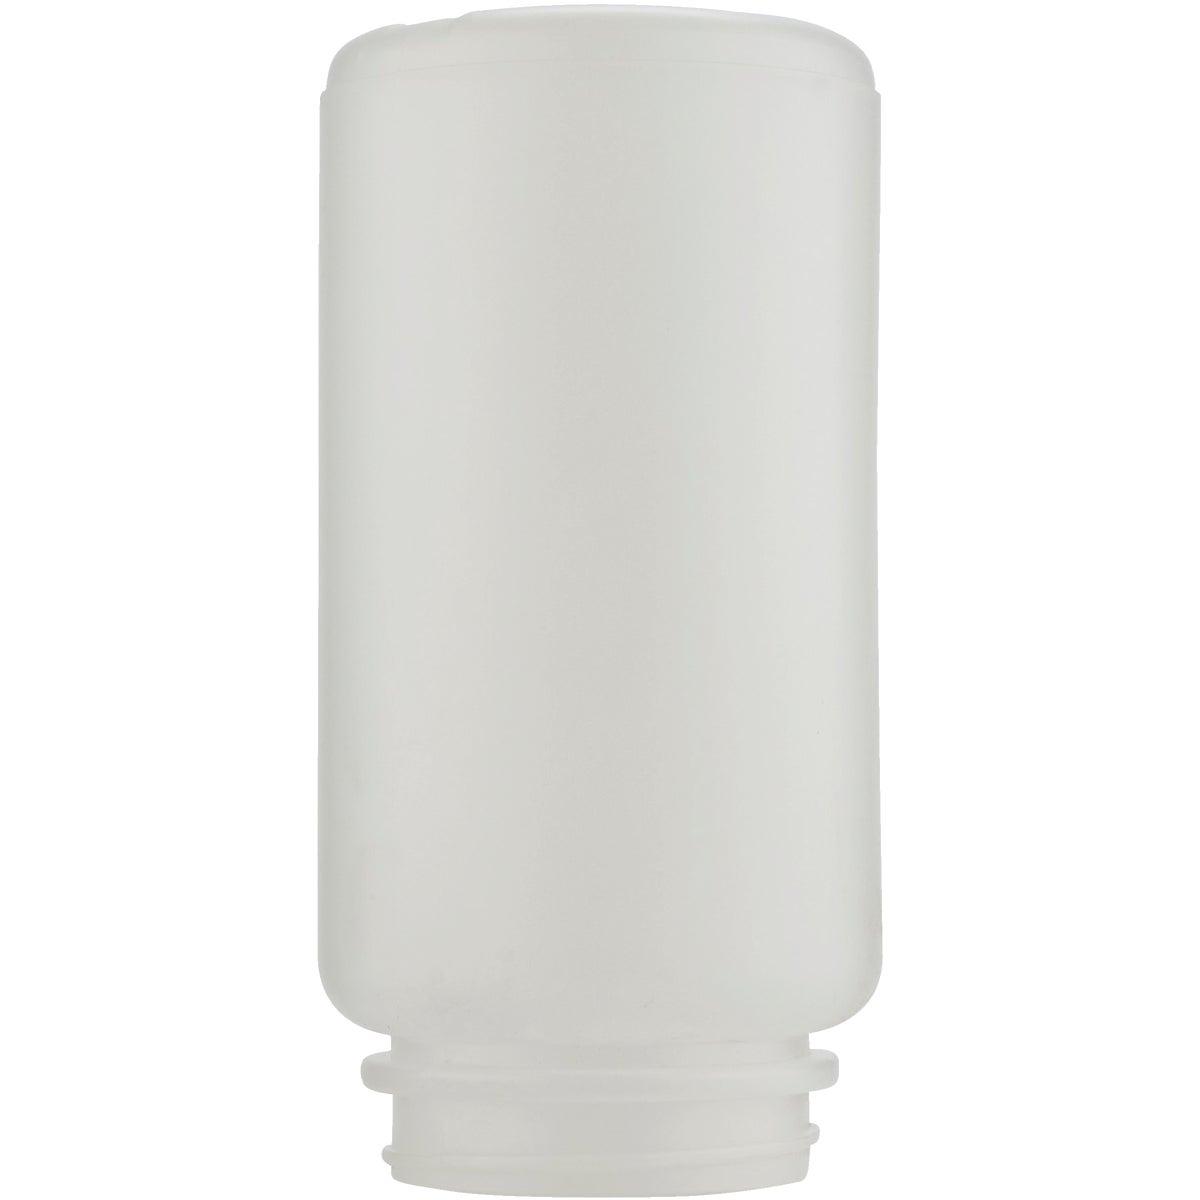 QT PLASTIC JAR - 690 by Miller Manufacturing